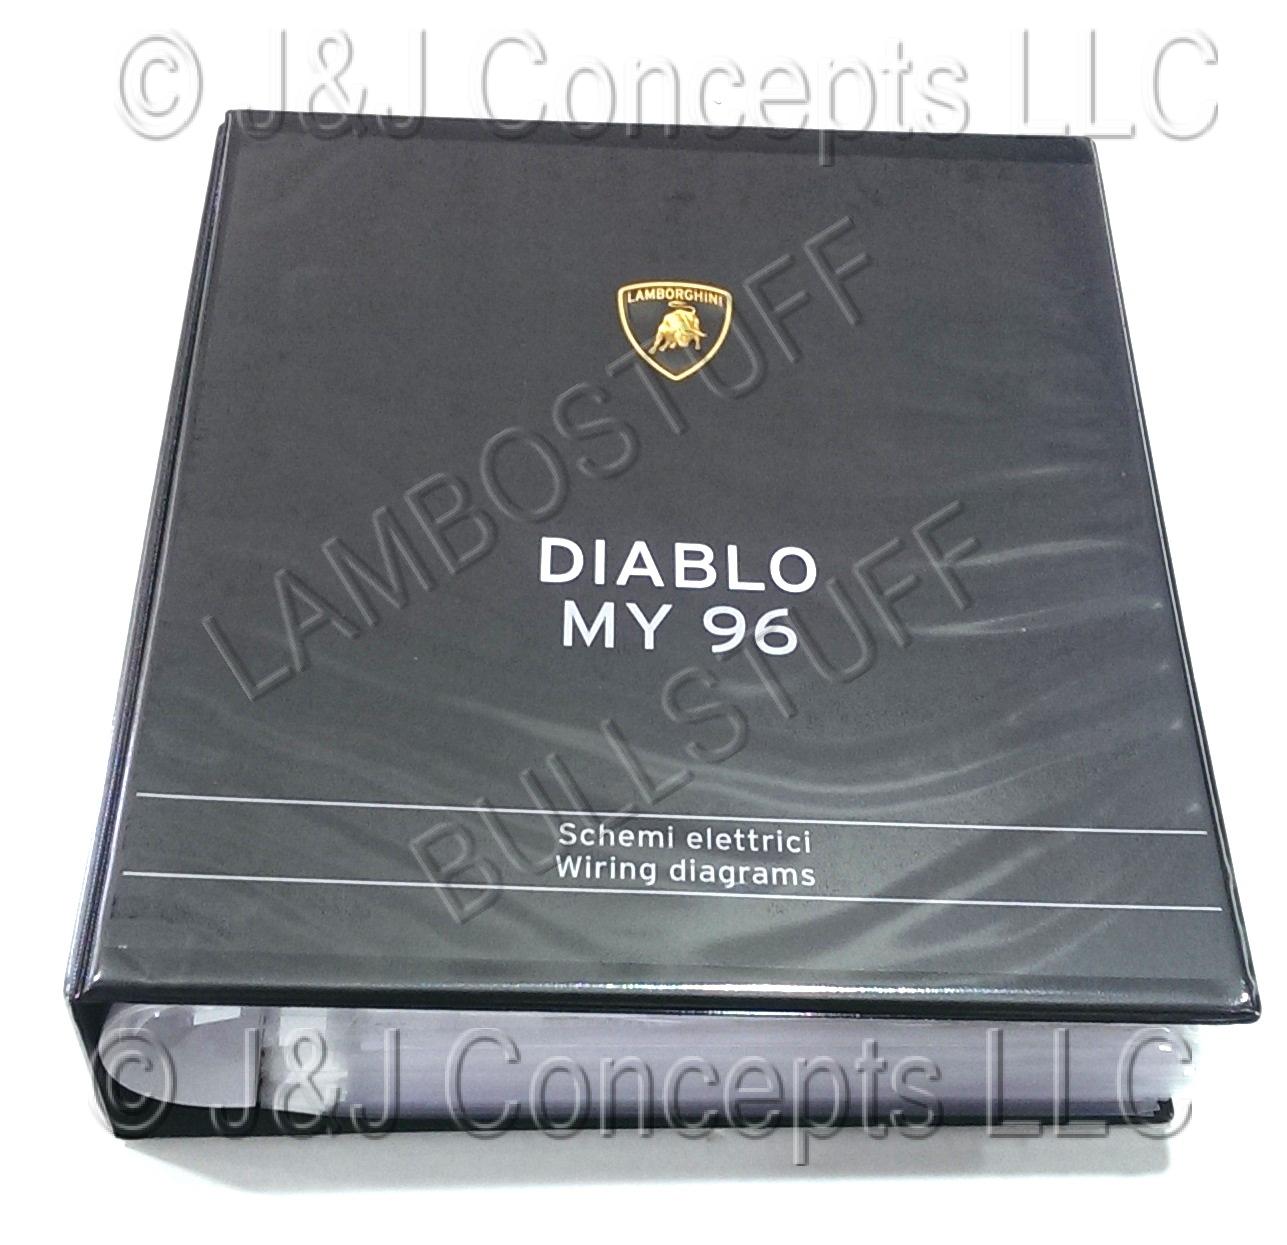 Lamborghini Wiring Manuals Original Factory – Lamborghini Countach Wiring Diagram